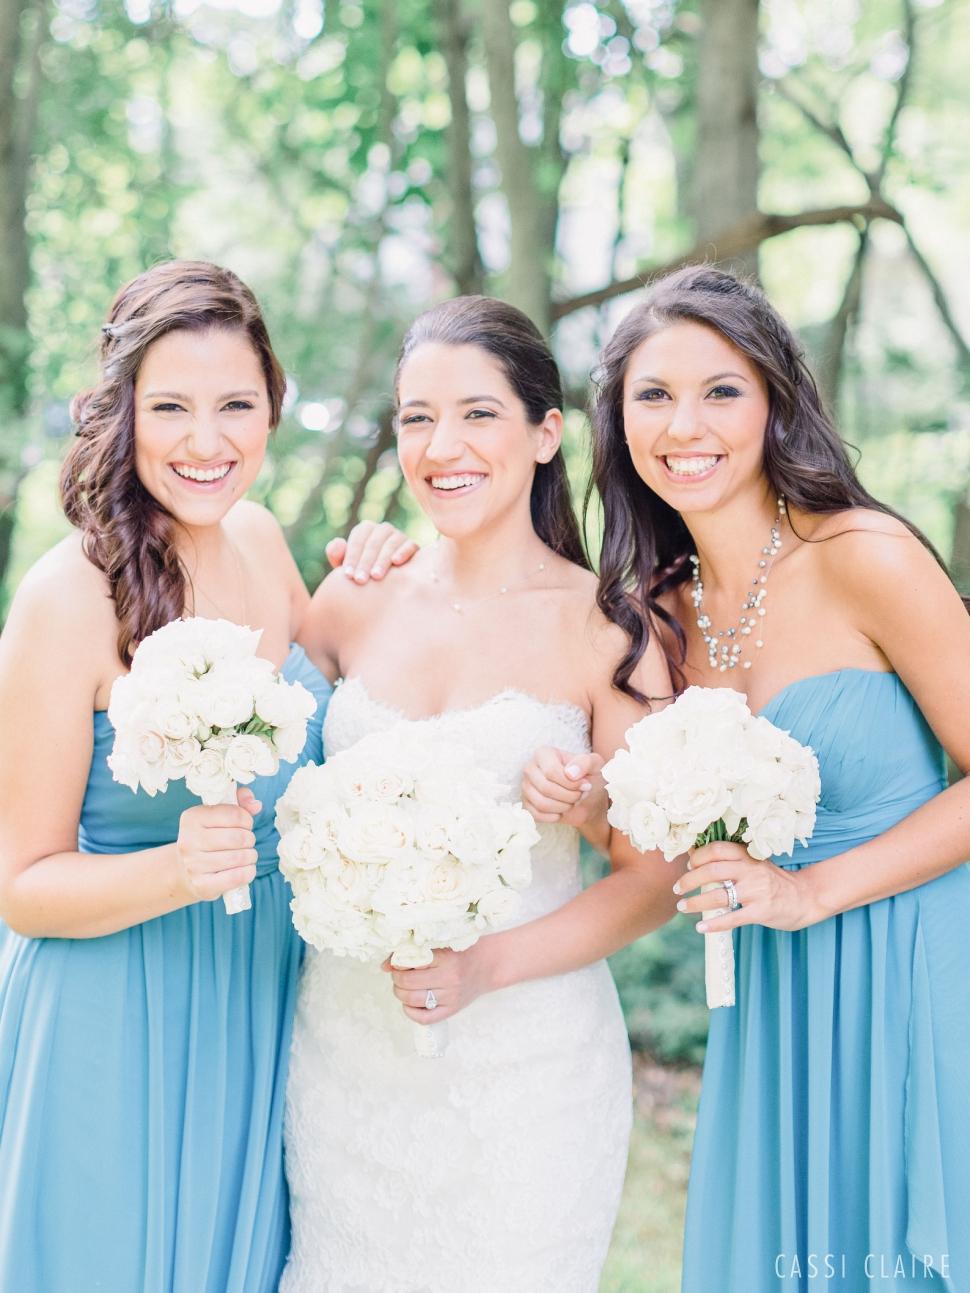 Canoe-Brook-Country-Club-New-Jersey-Wedding-Photographer_05.jpg